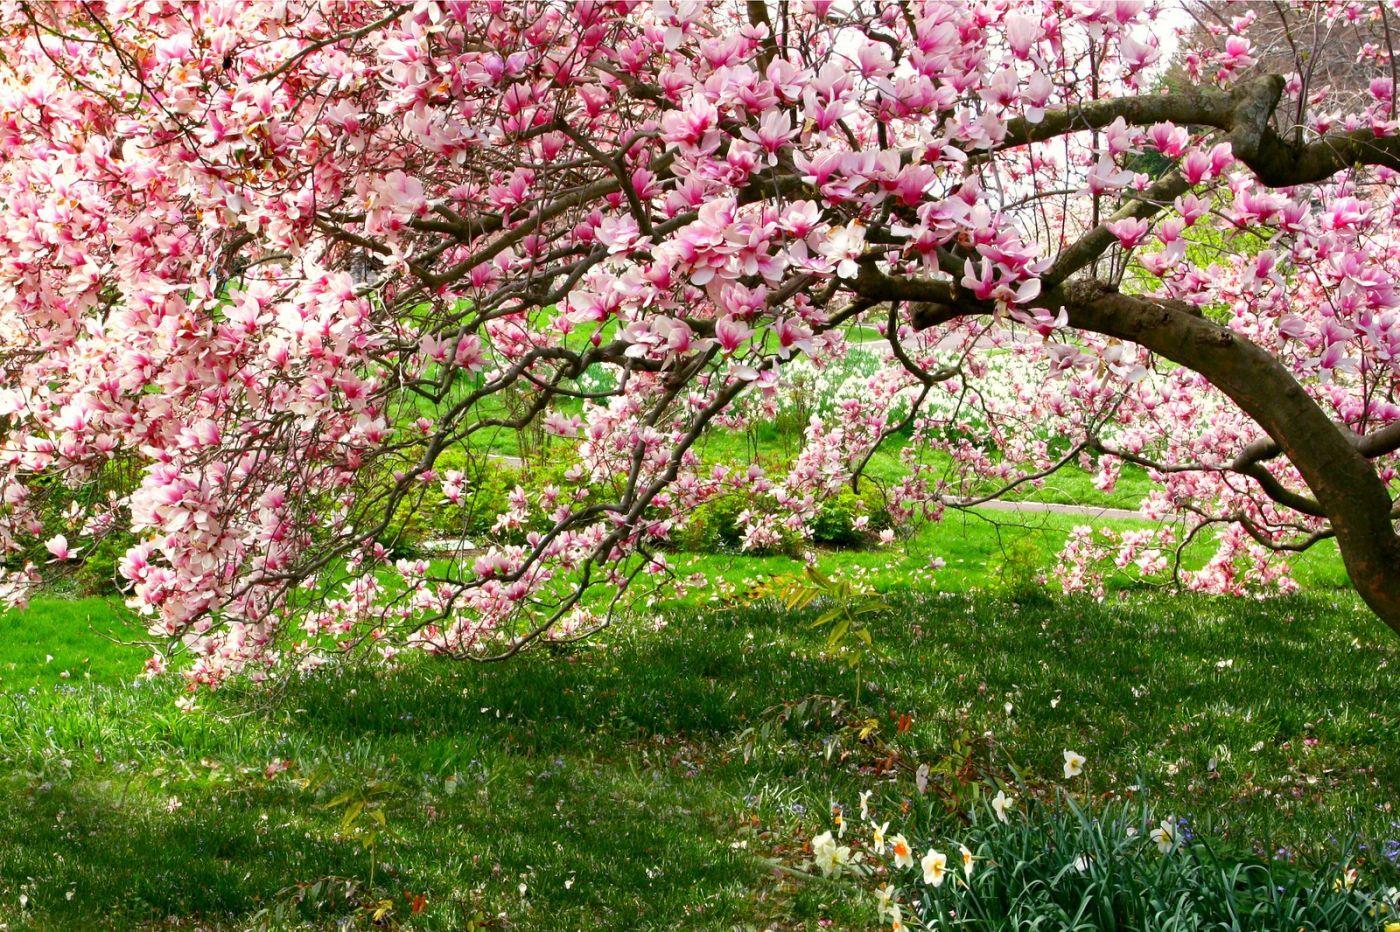 Chanticleer花园,点亮心灵_图1-36